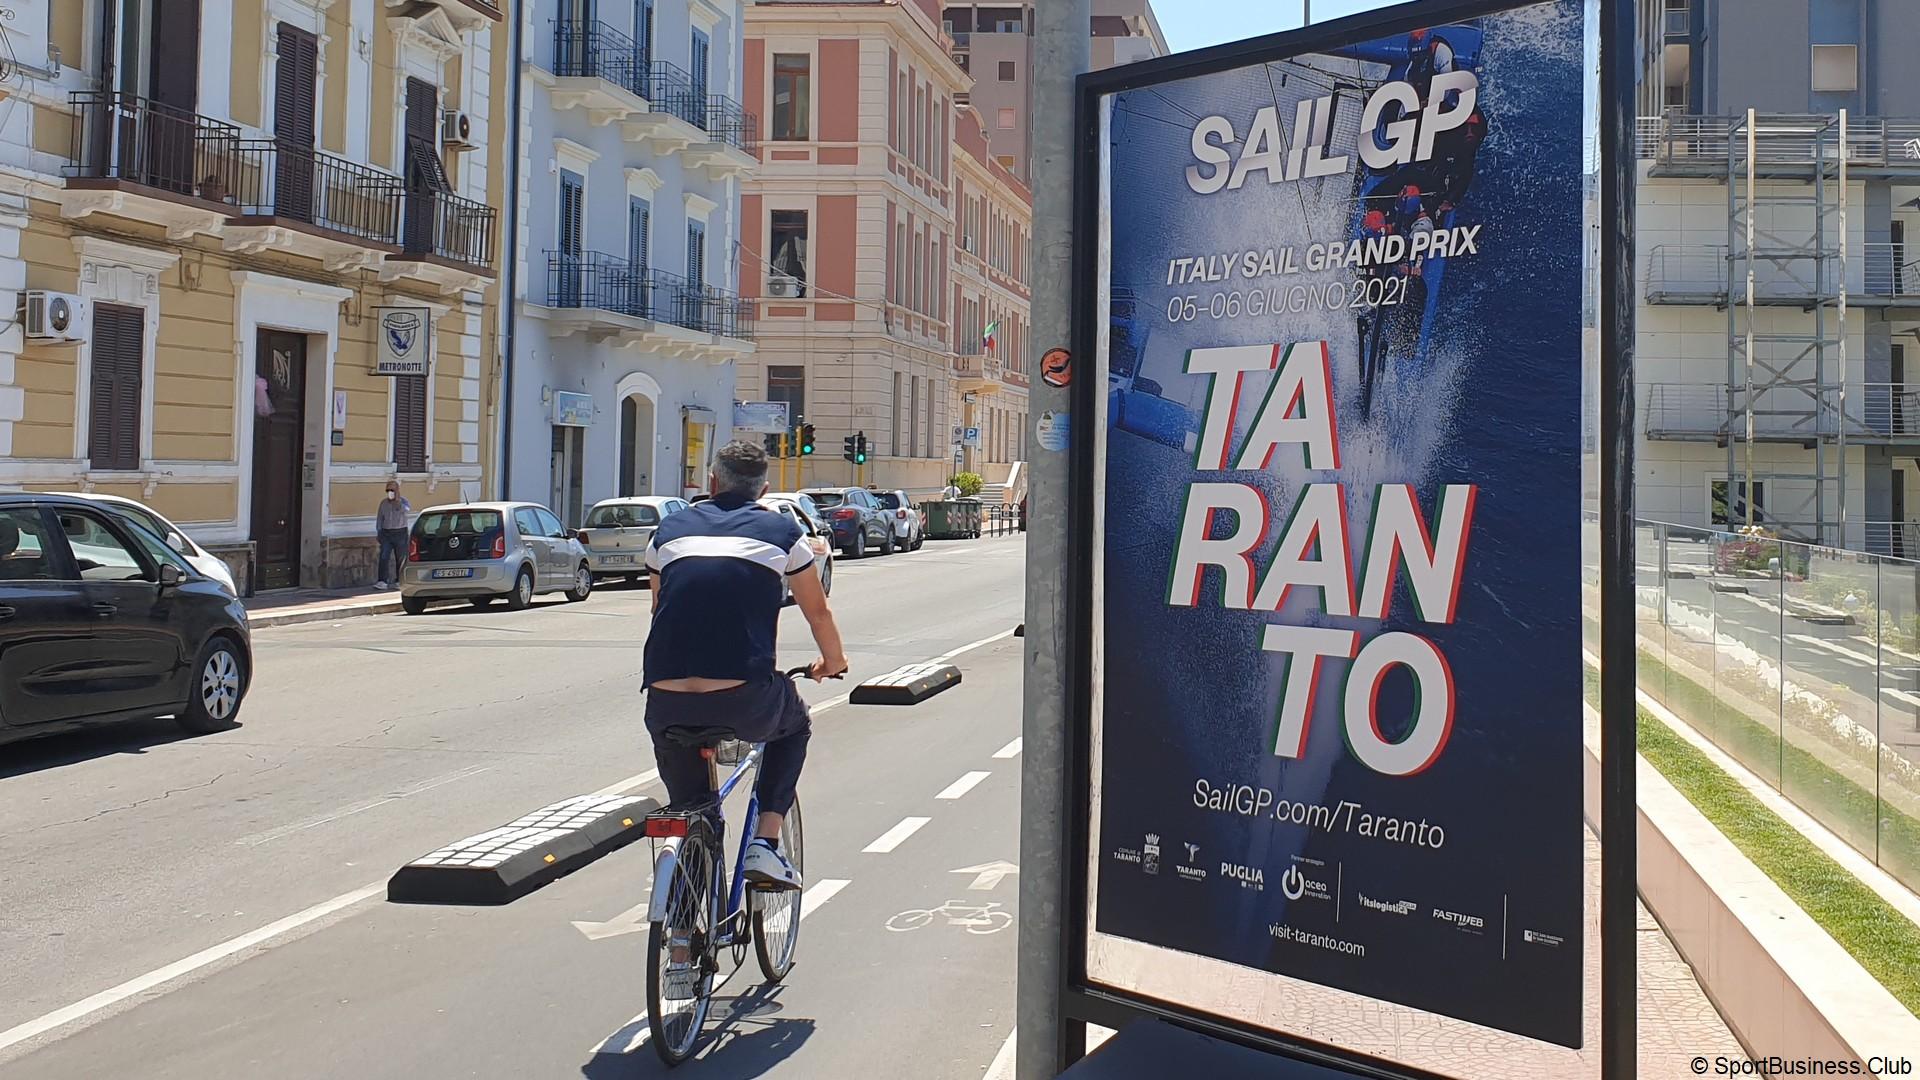 Sail GP Tarente